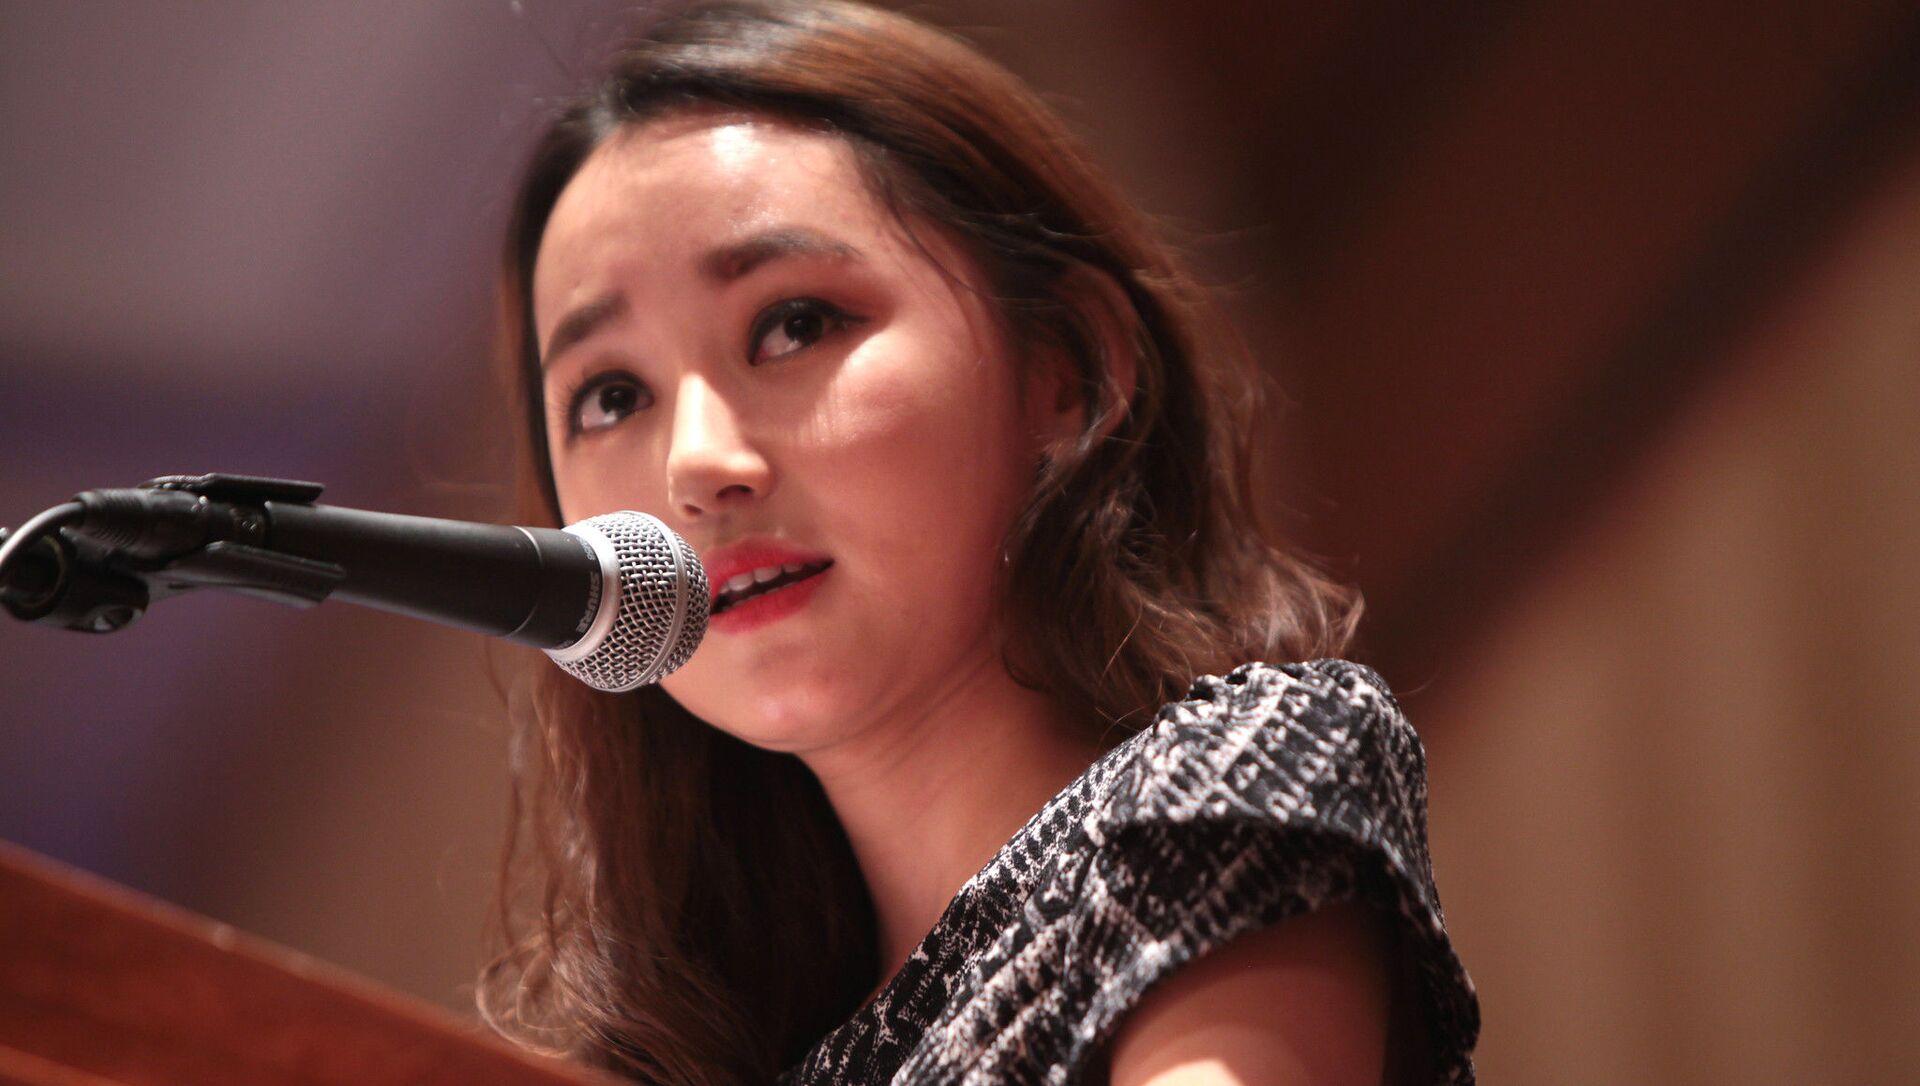 Yeon-mi Park speaking at the 2015 International Students for Liberty Conference at the Marriott Wardman Park Hotel in Washington, D.C. - Sputnik International, 1920, 15.06.2021